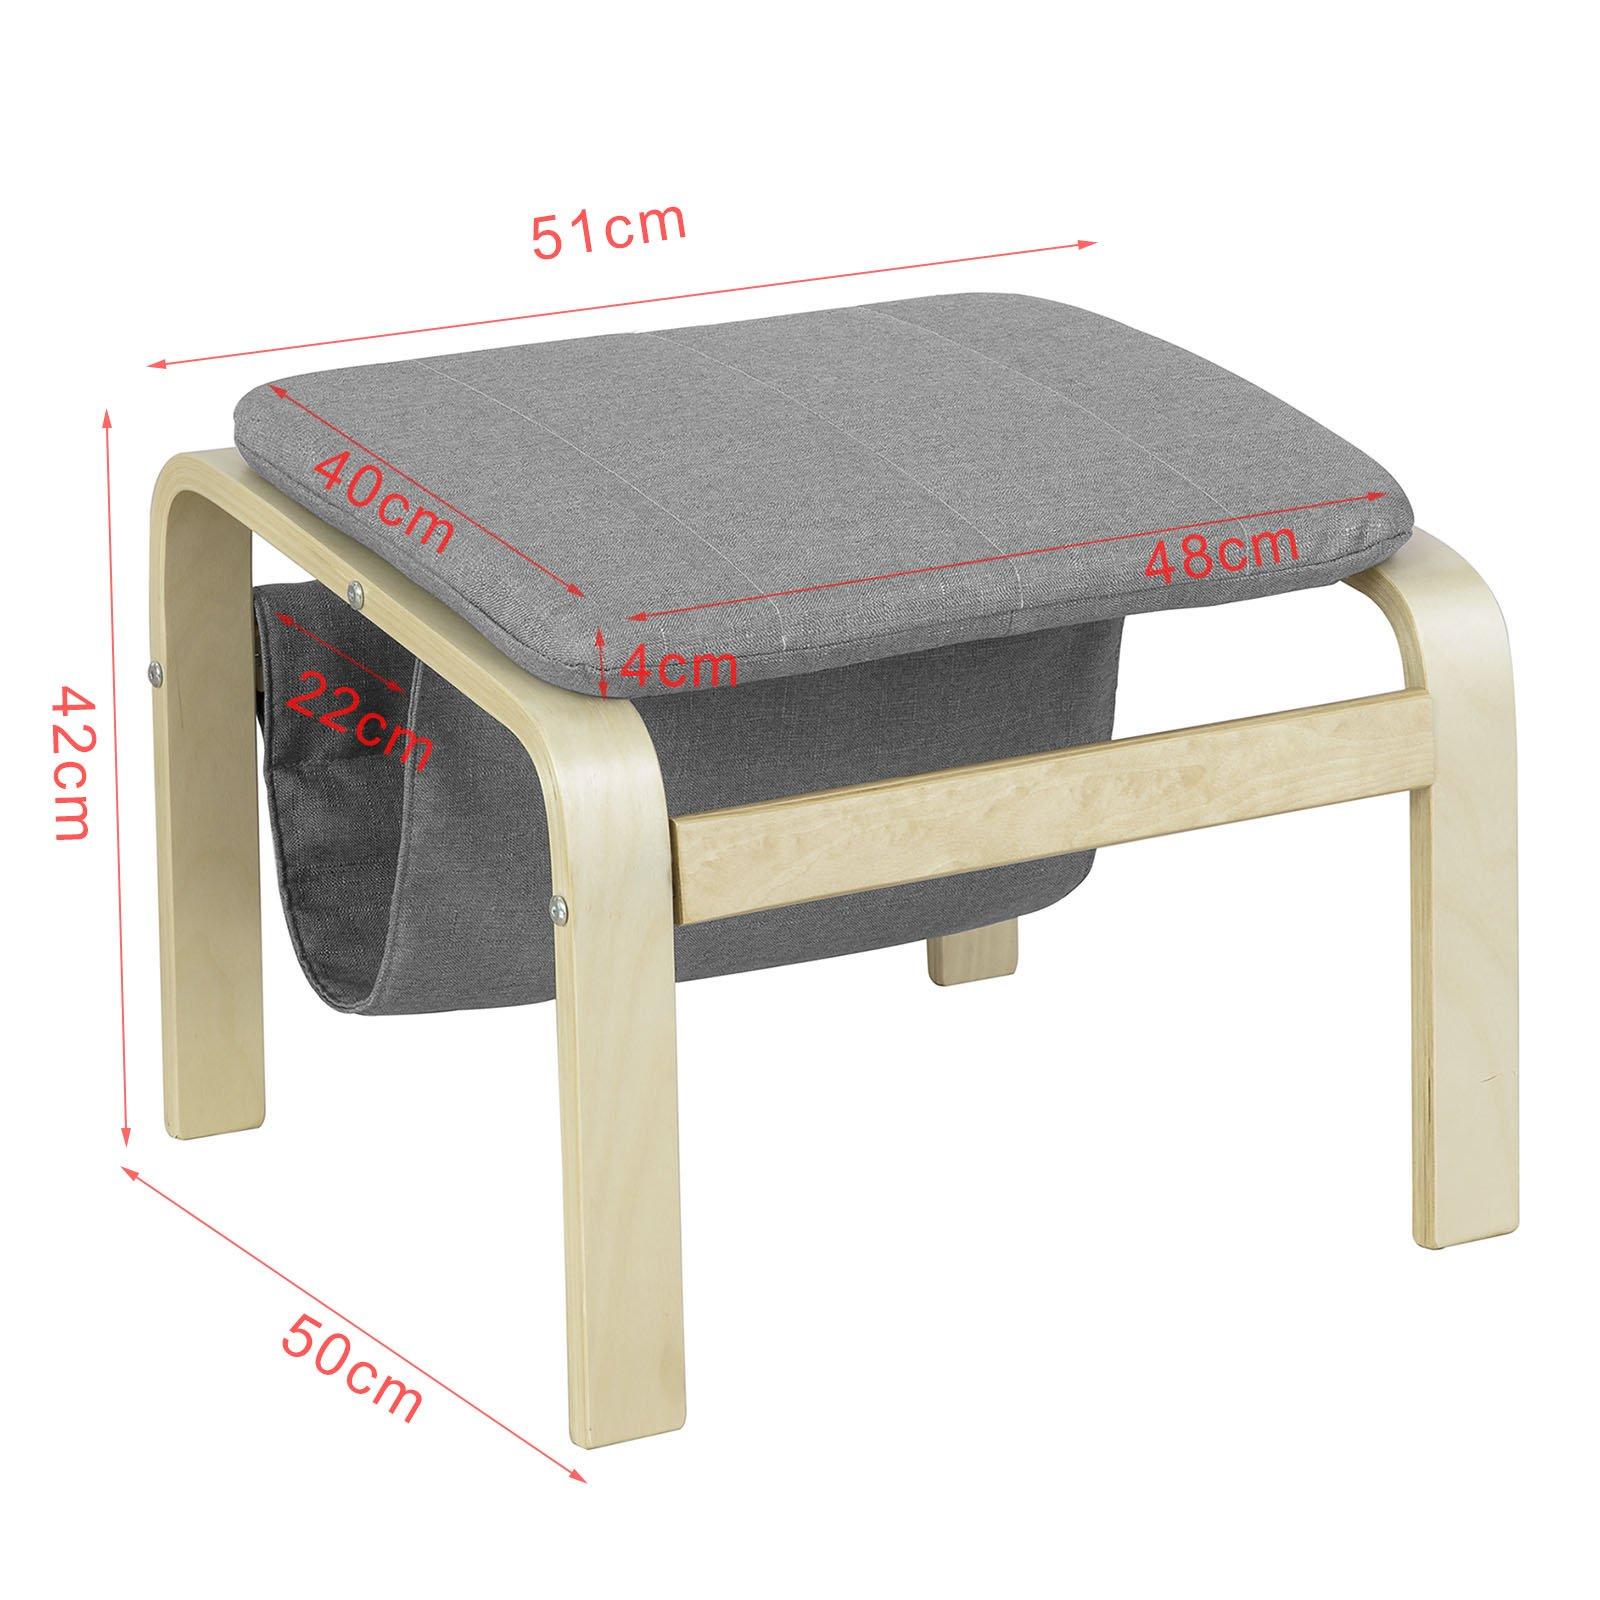 Moll intello de alto rendimiento Vapor freno/ /150/cm x 50/m